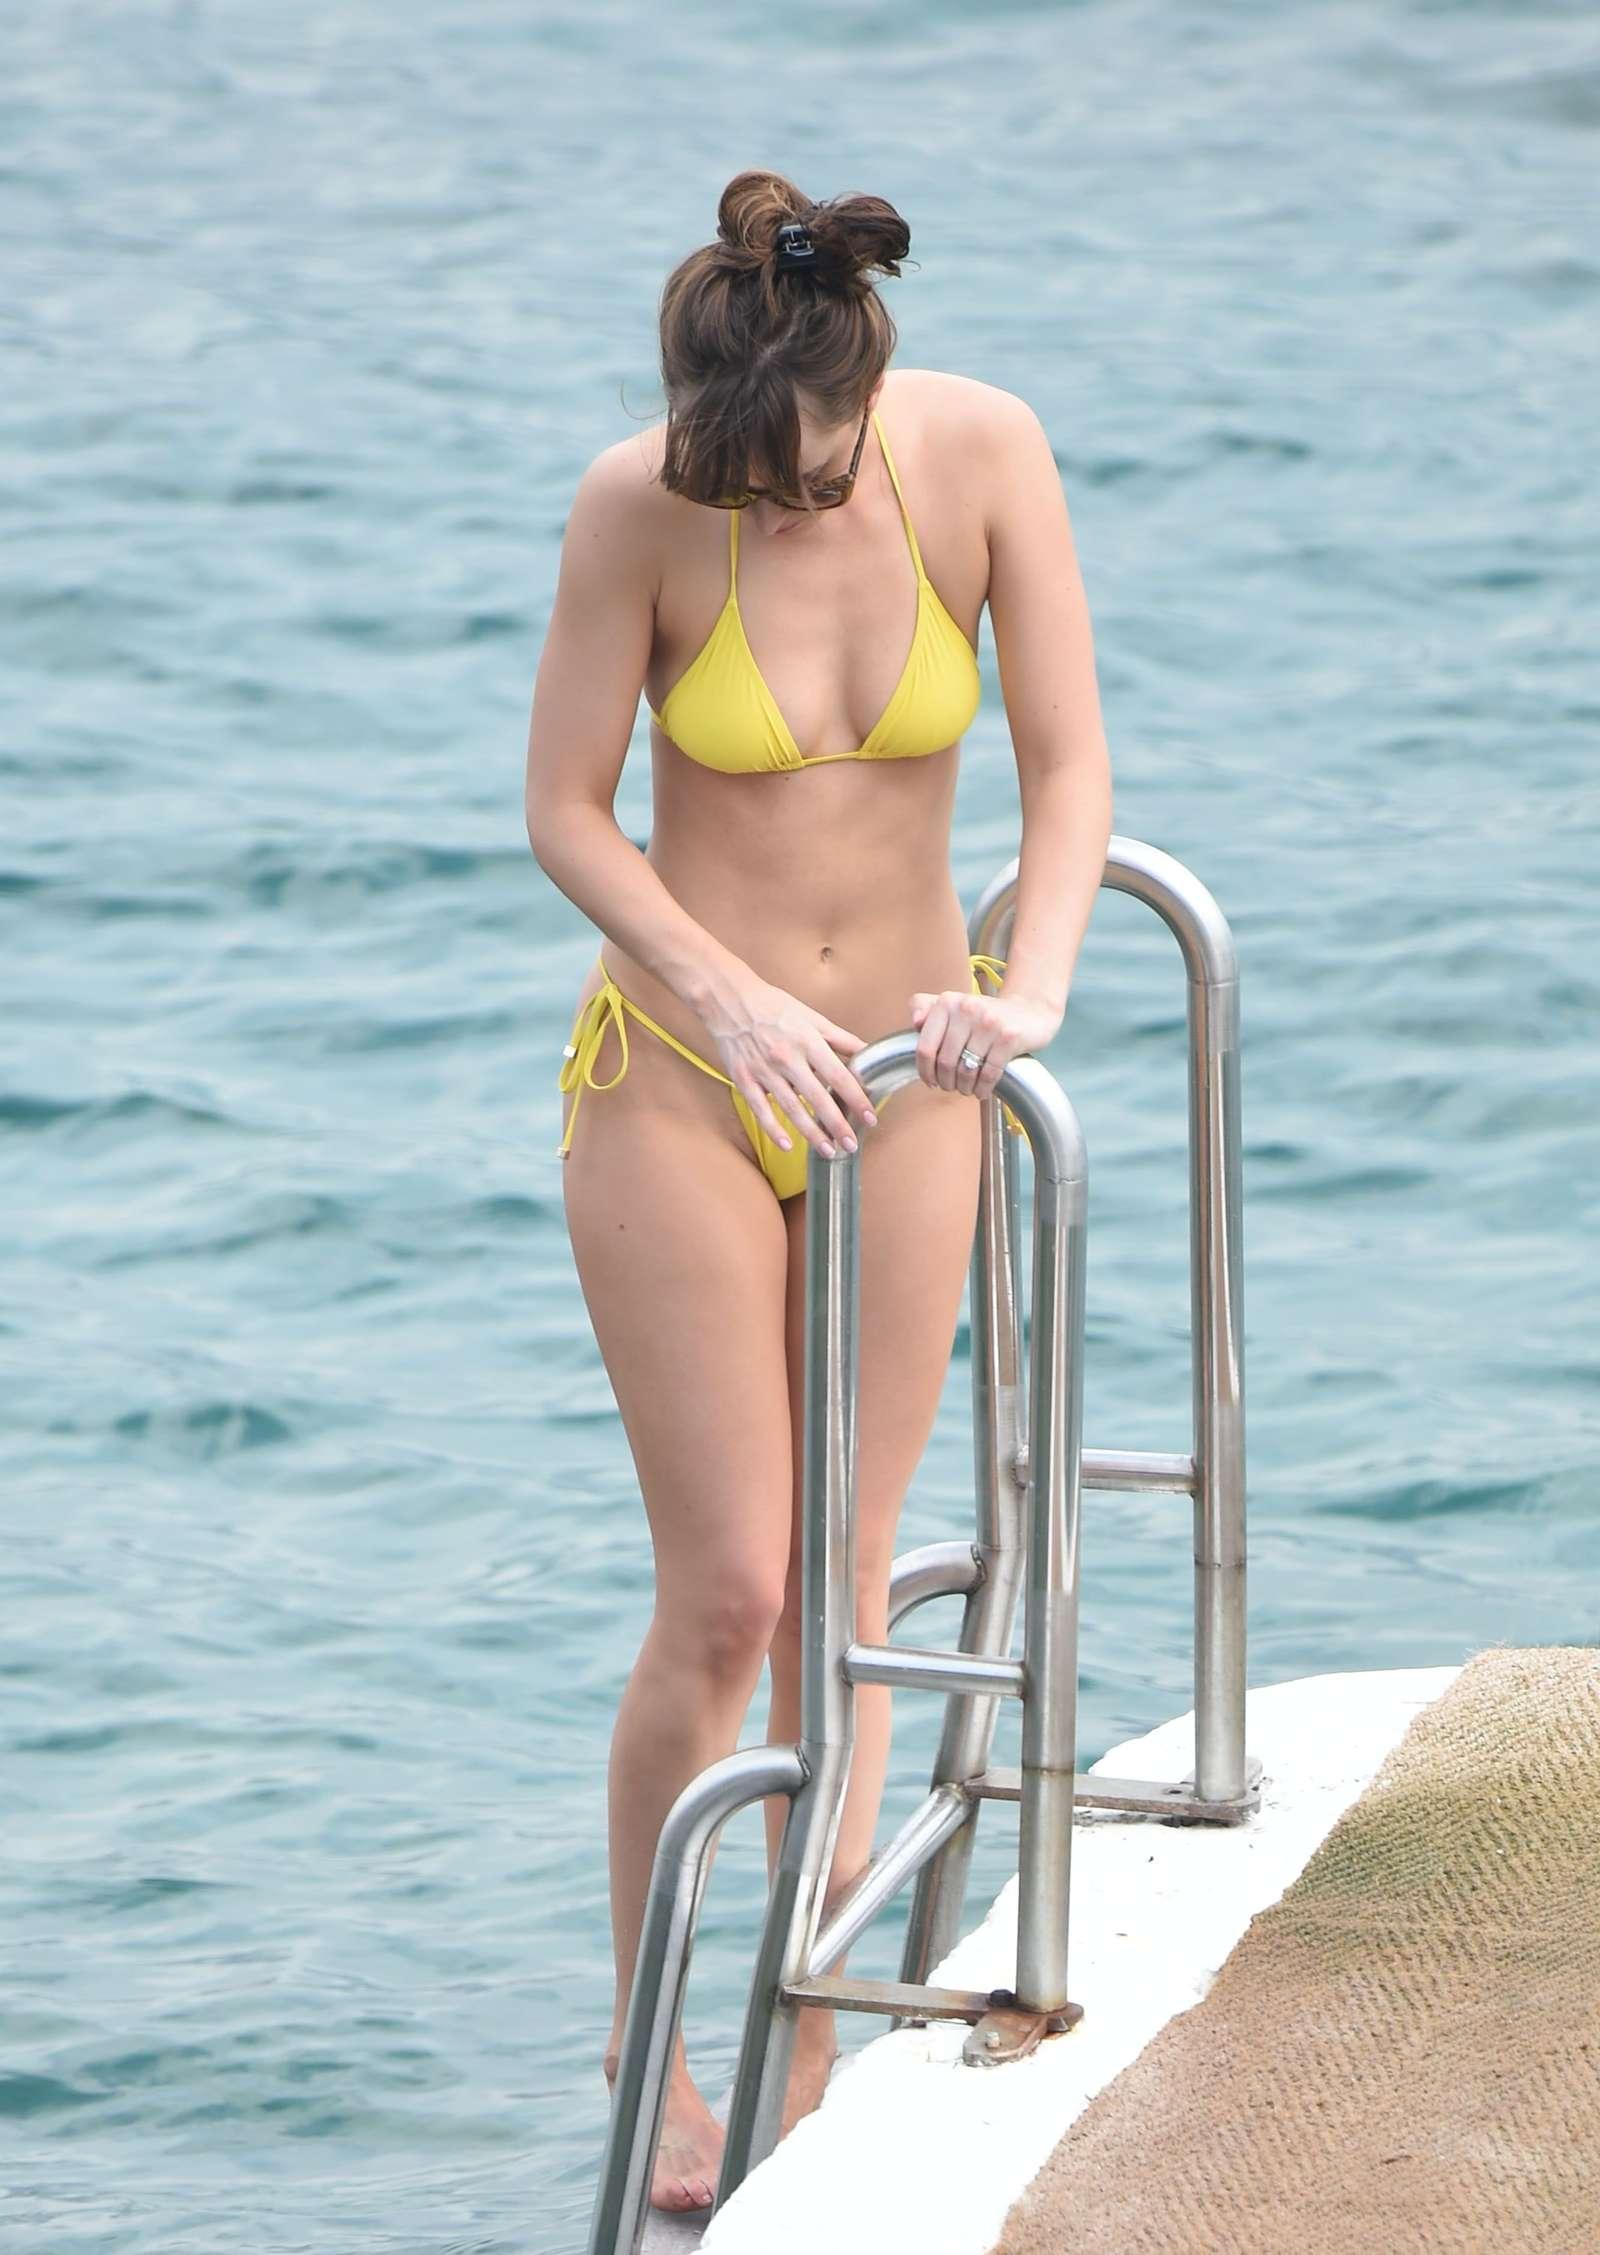 Dakota Johnson 2016 : Dakota Johnson in Yellow Bikini 2016 -31